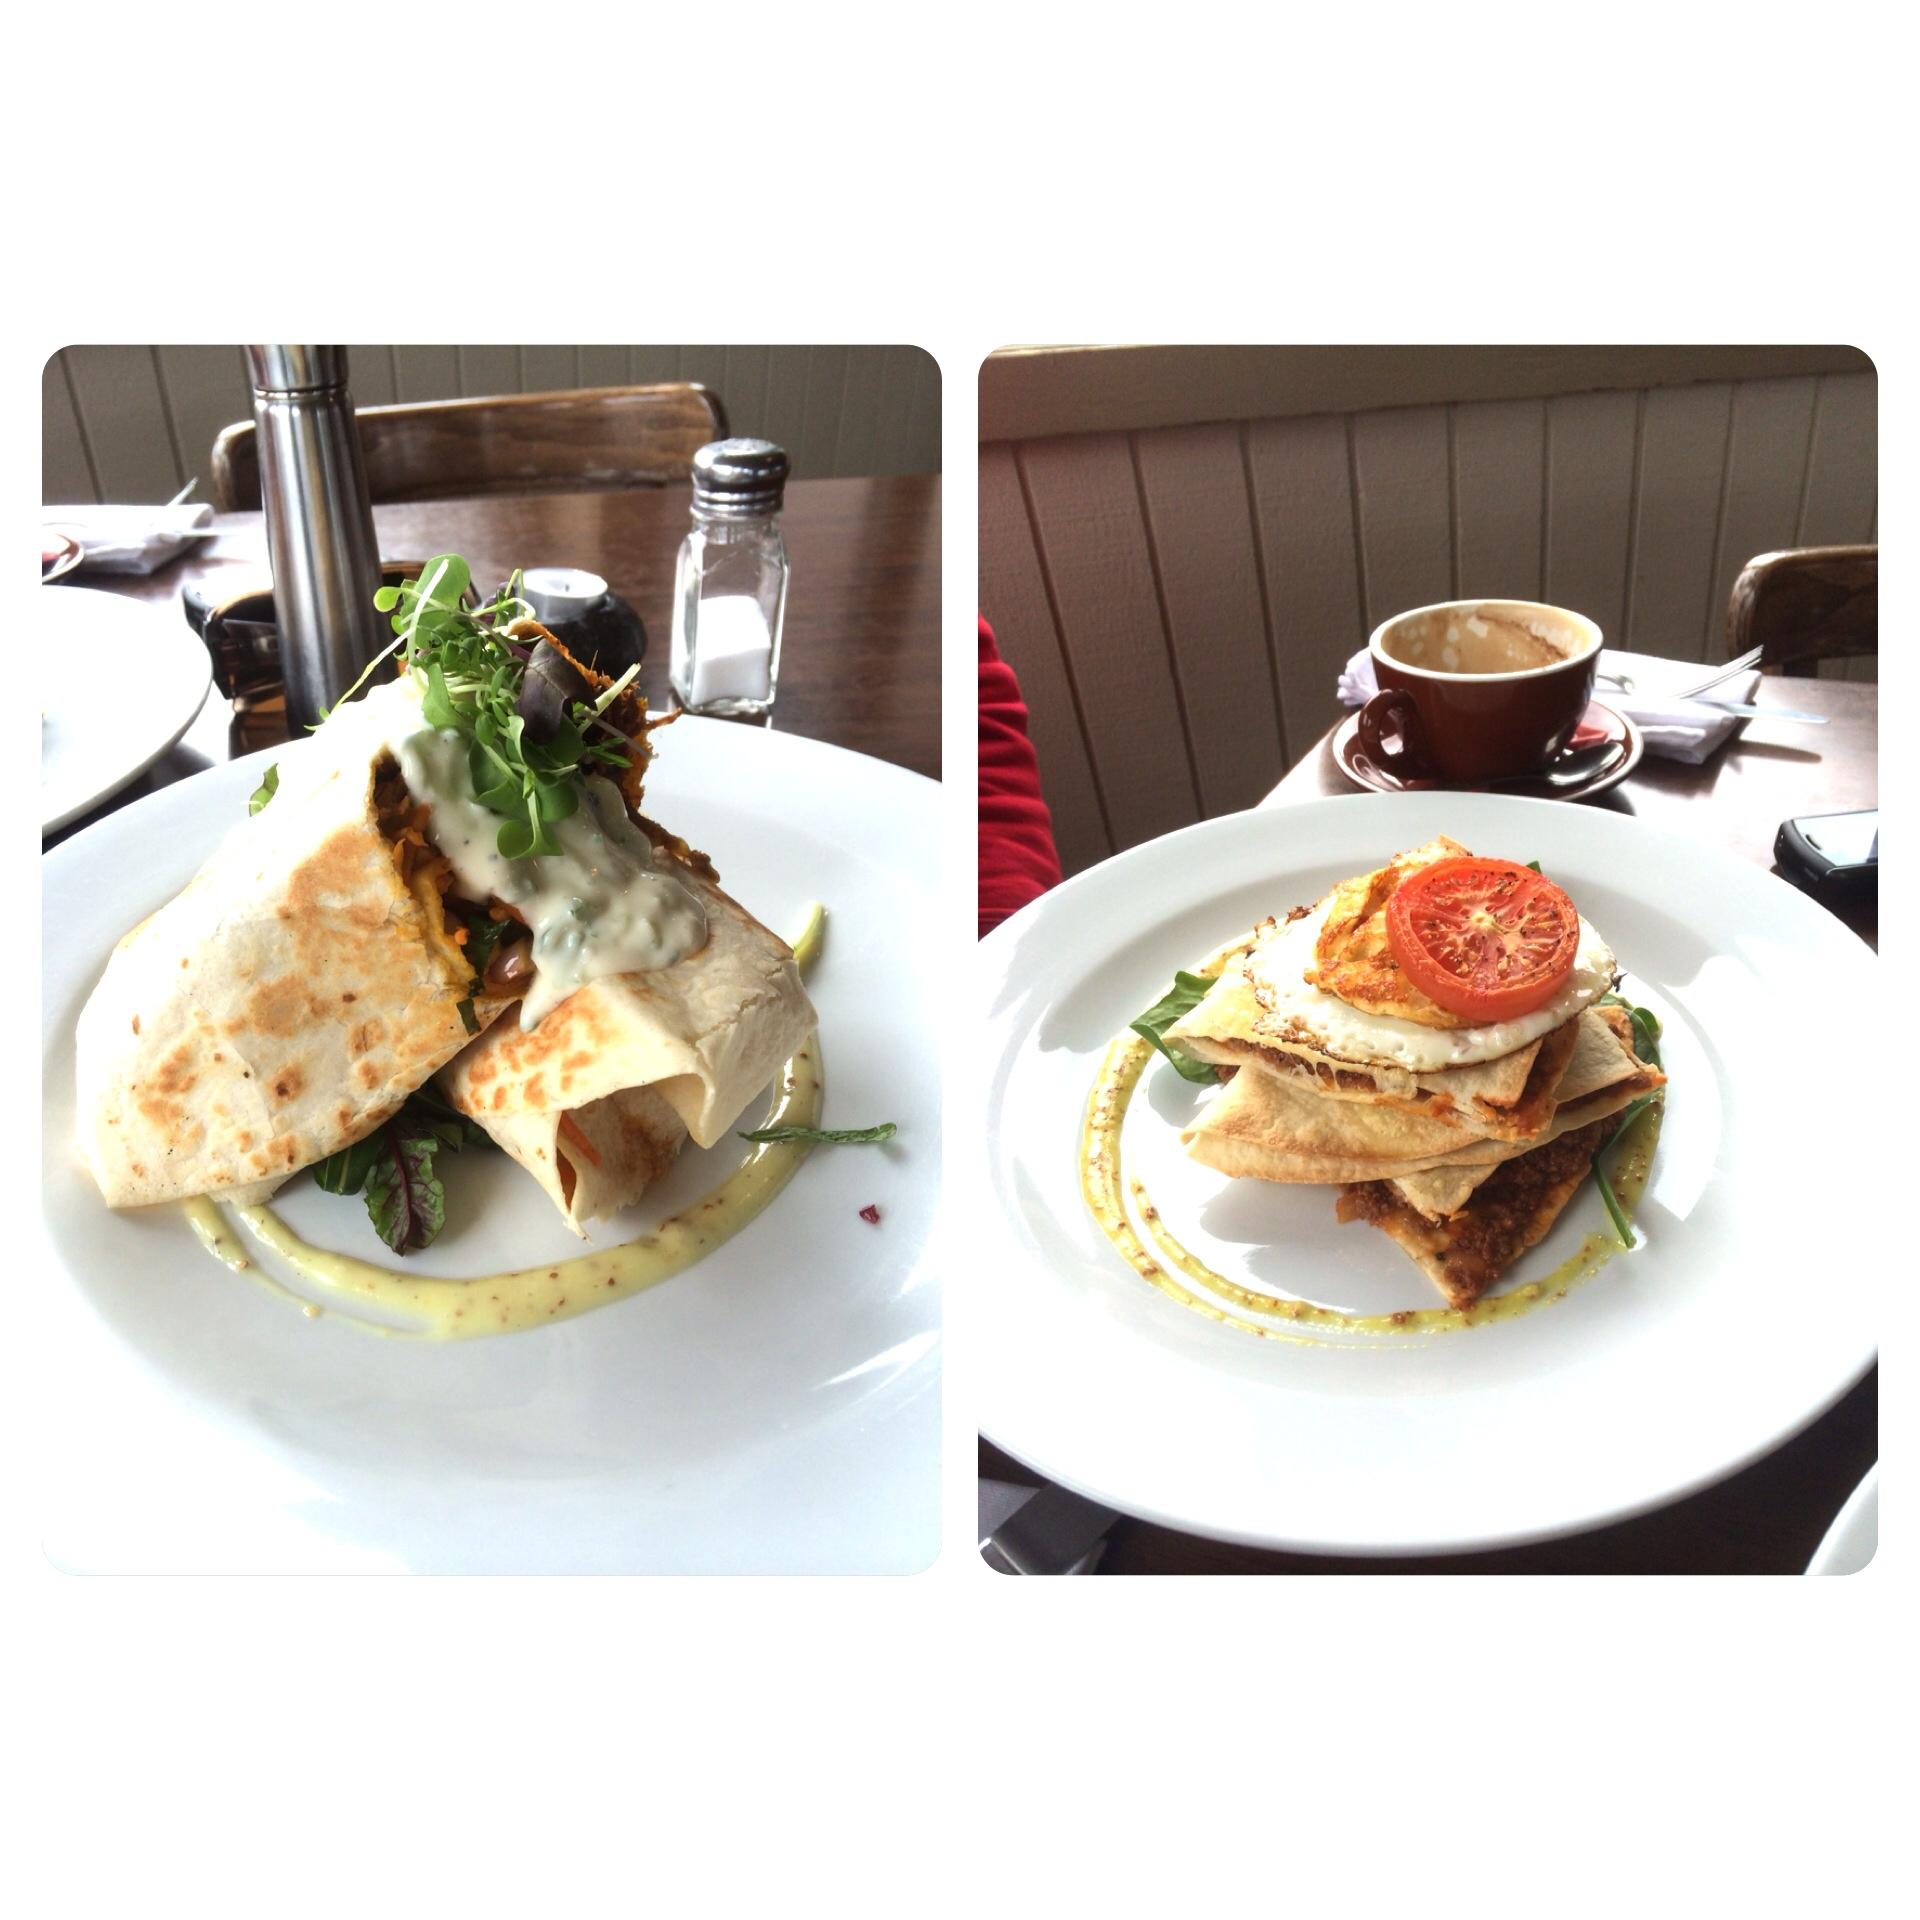 Clevedon Cafe Menu